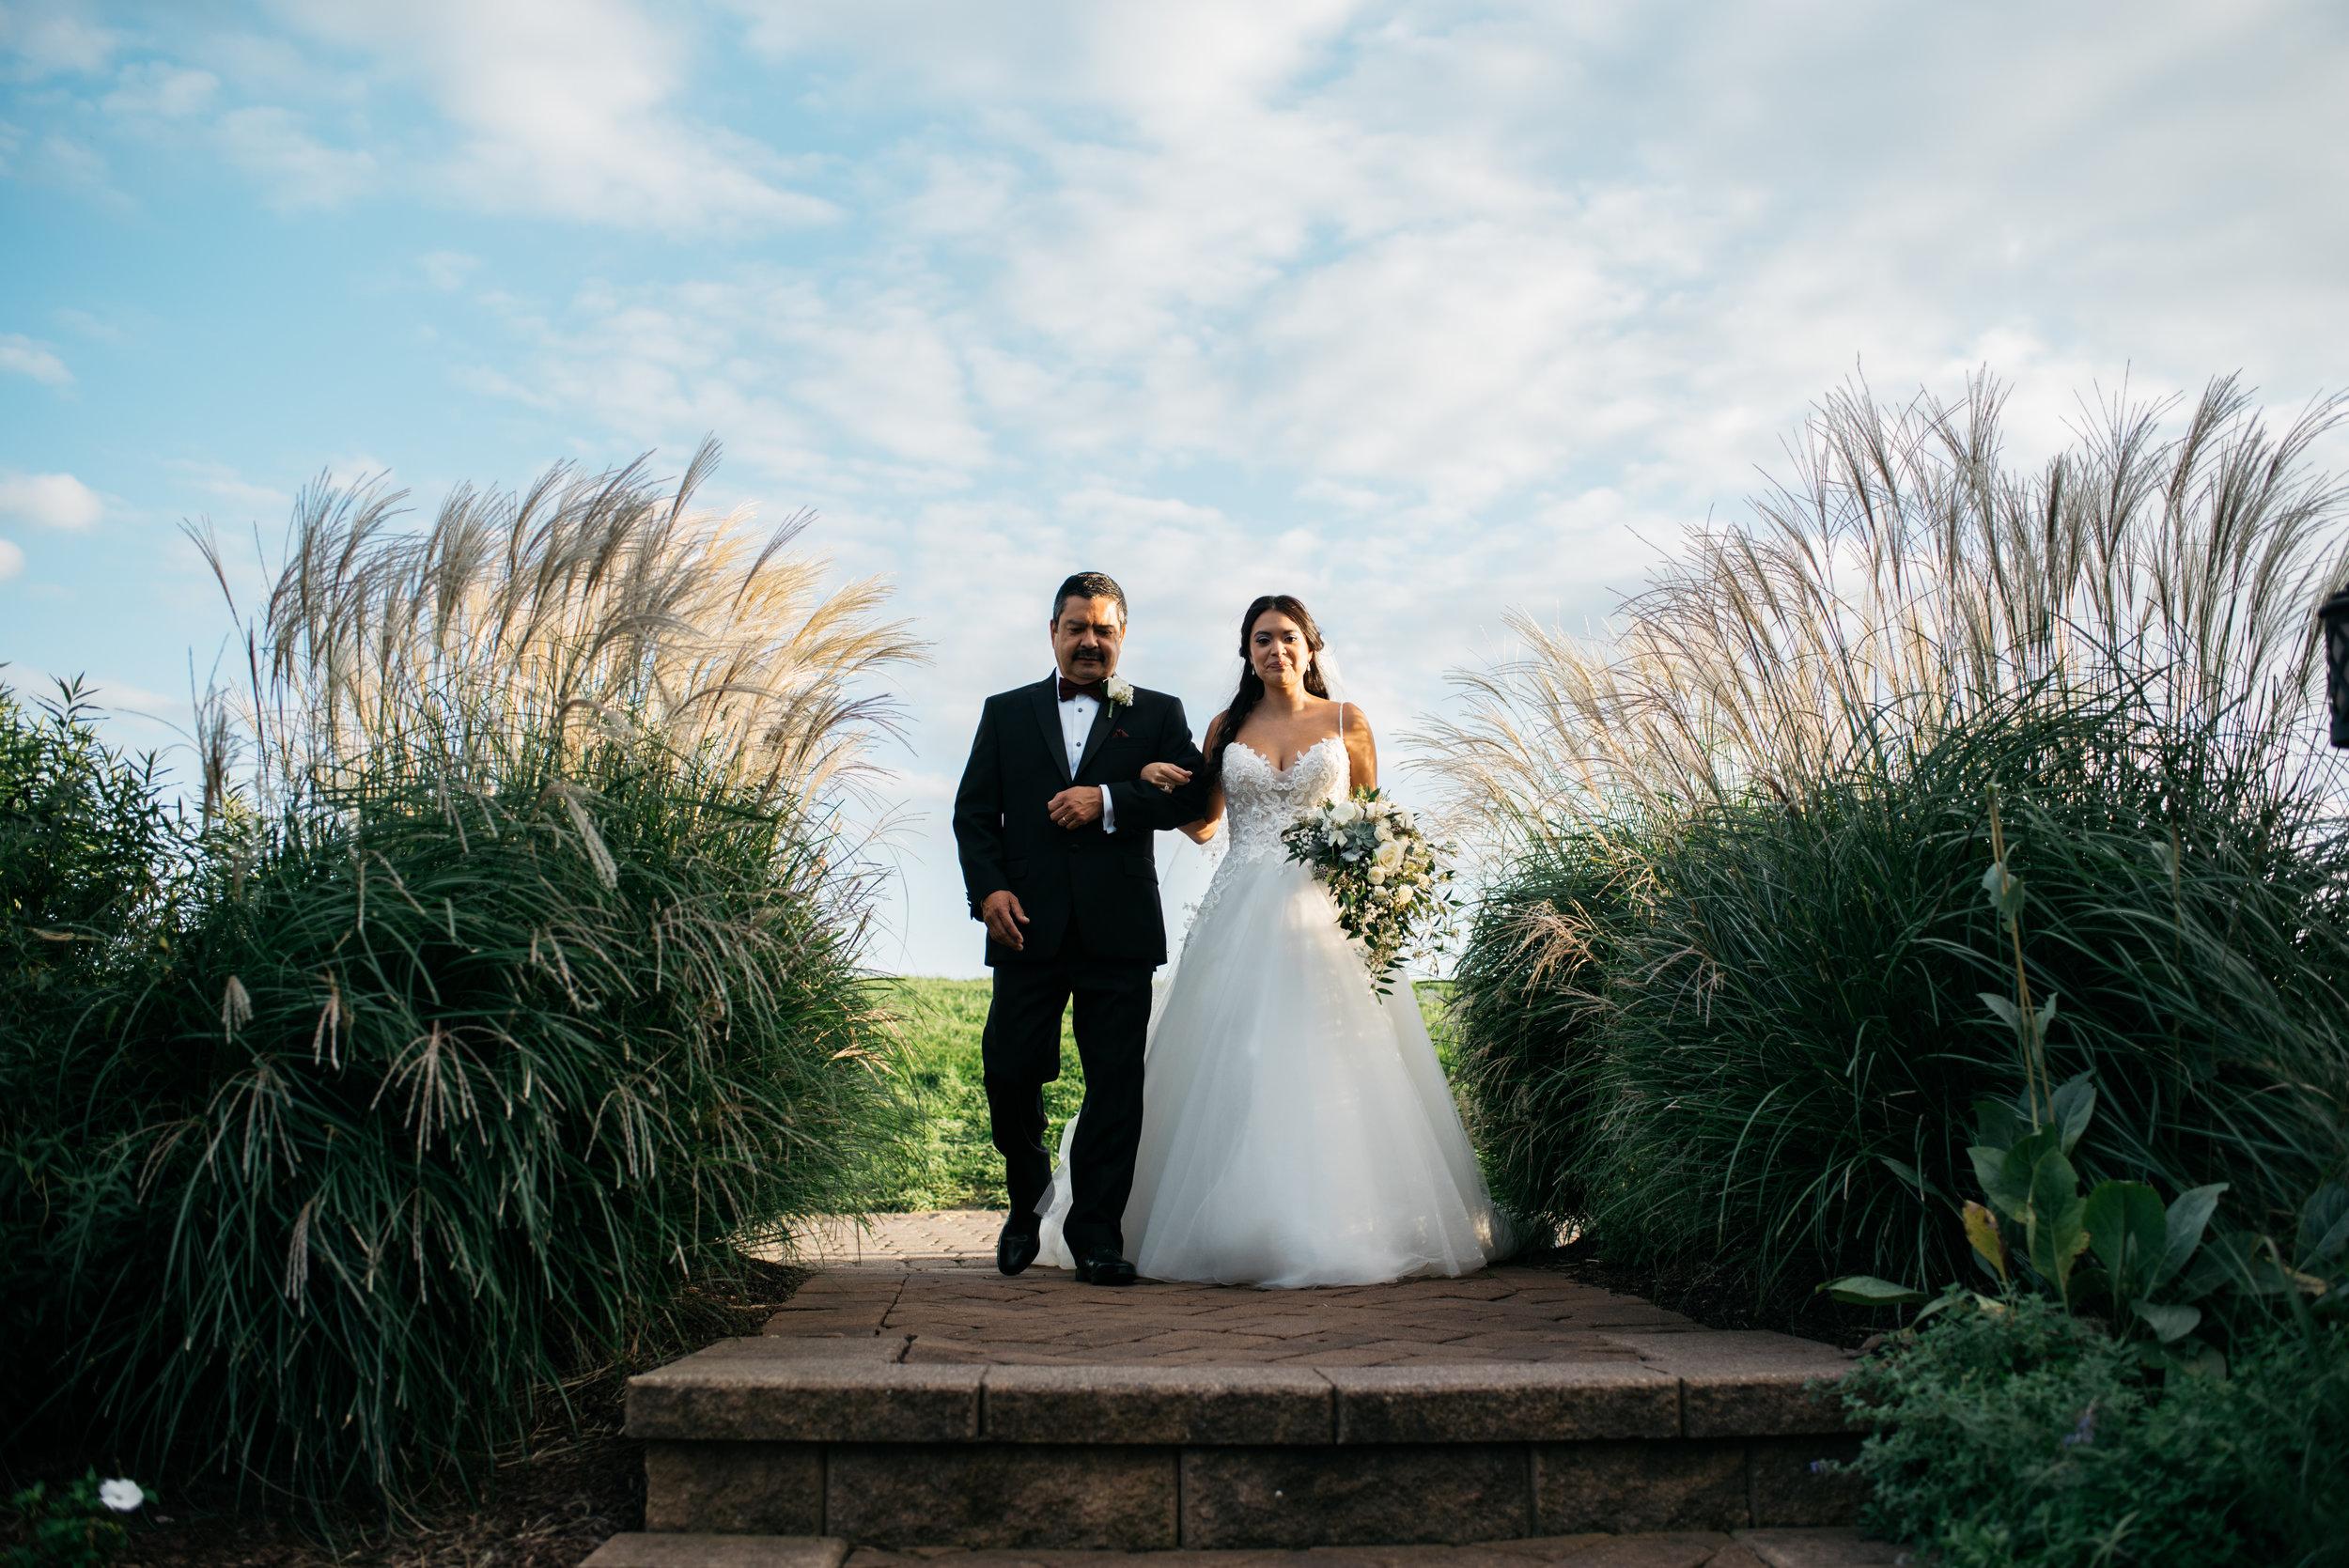 WeddingPhotos | NJPhotographer | Highlights-9-22.jpg